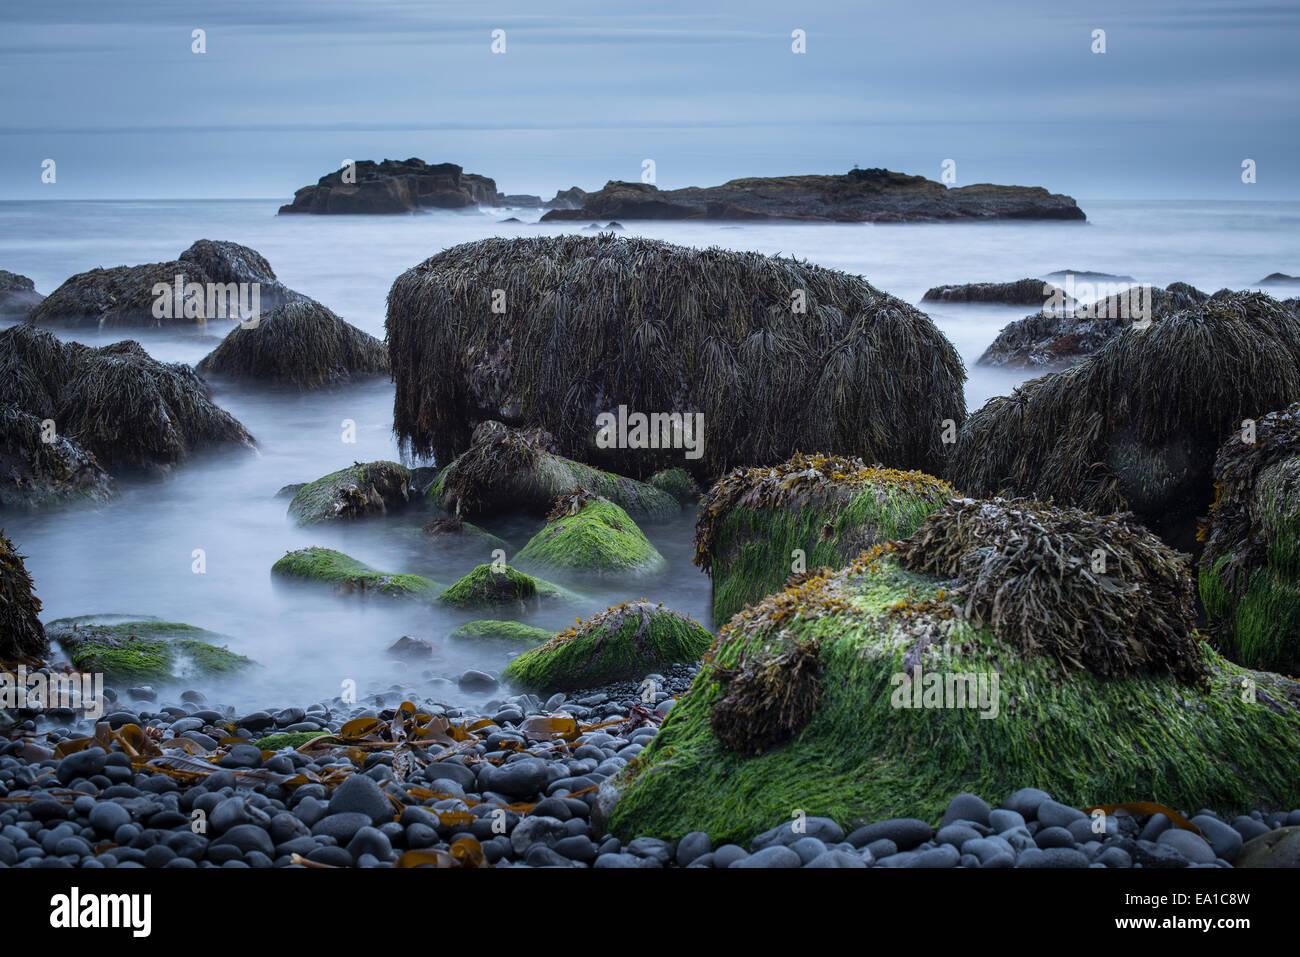 Close up of rocks and sea, Malarif, Snaefellsnes, Iceland - Stock Image